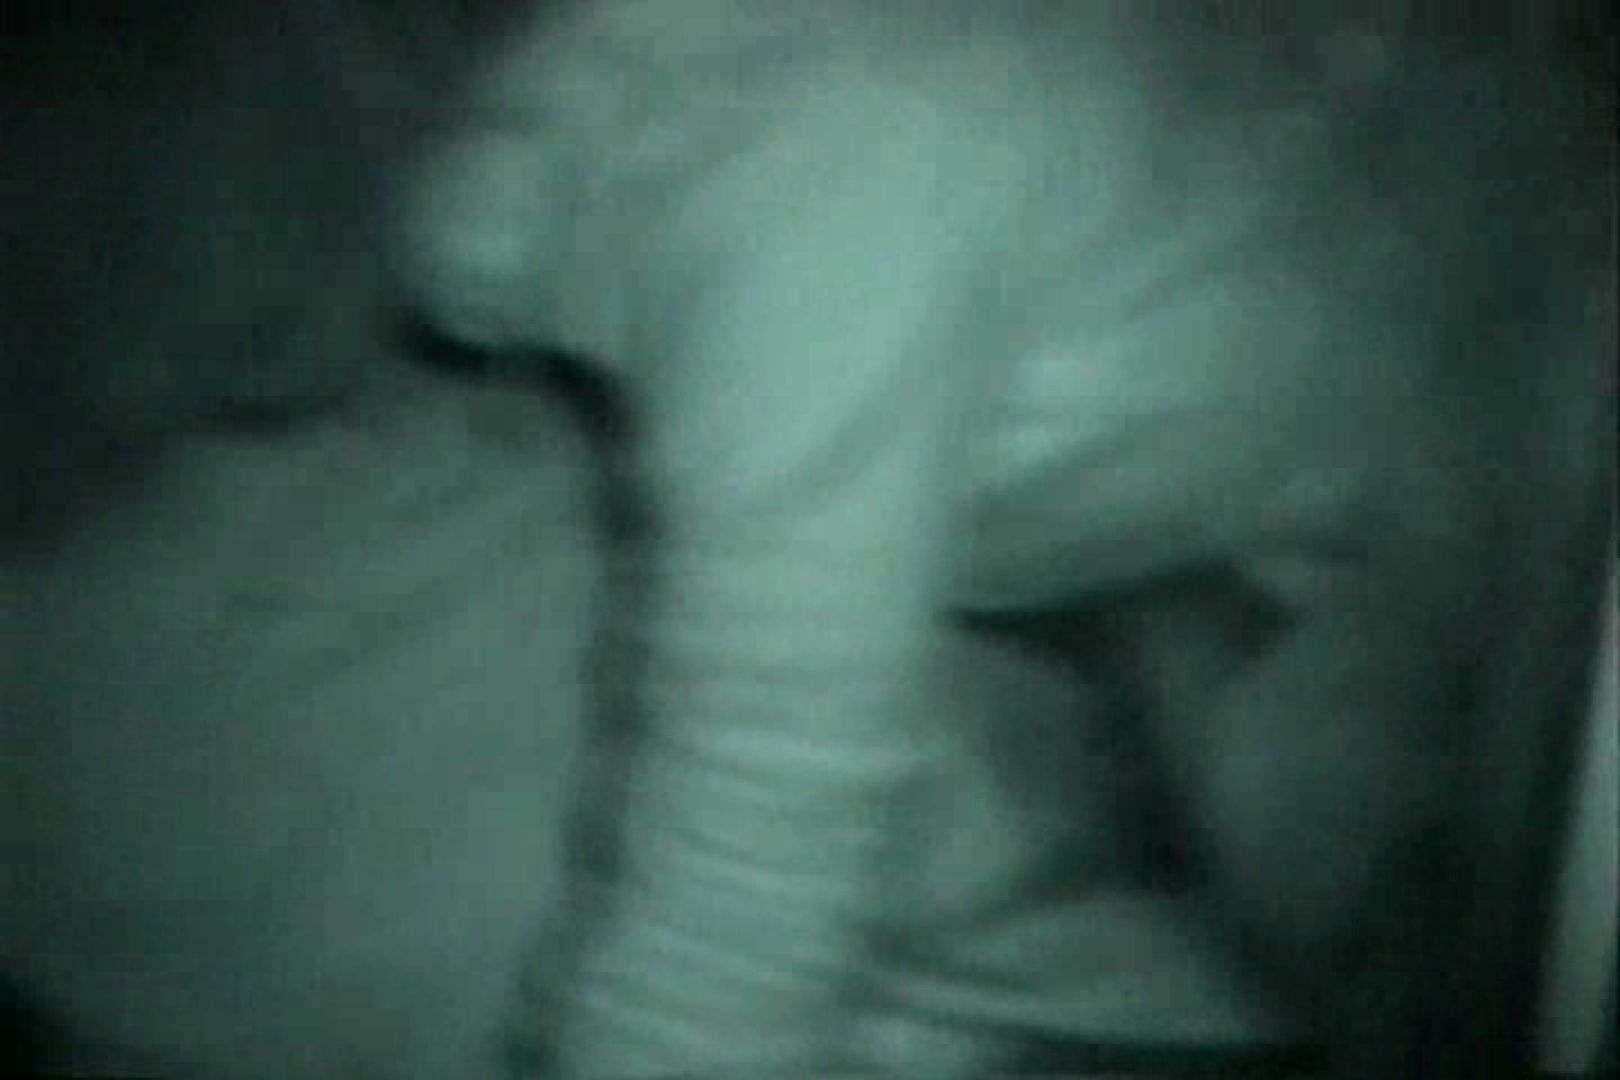 充血監督の深夜の運動会Vol.126 赤外線 エロ無料画像 107画像 78